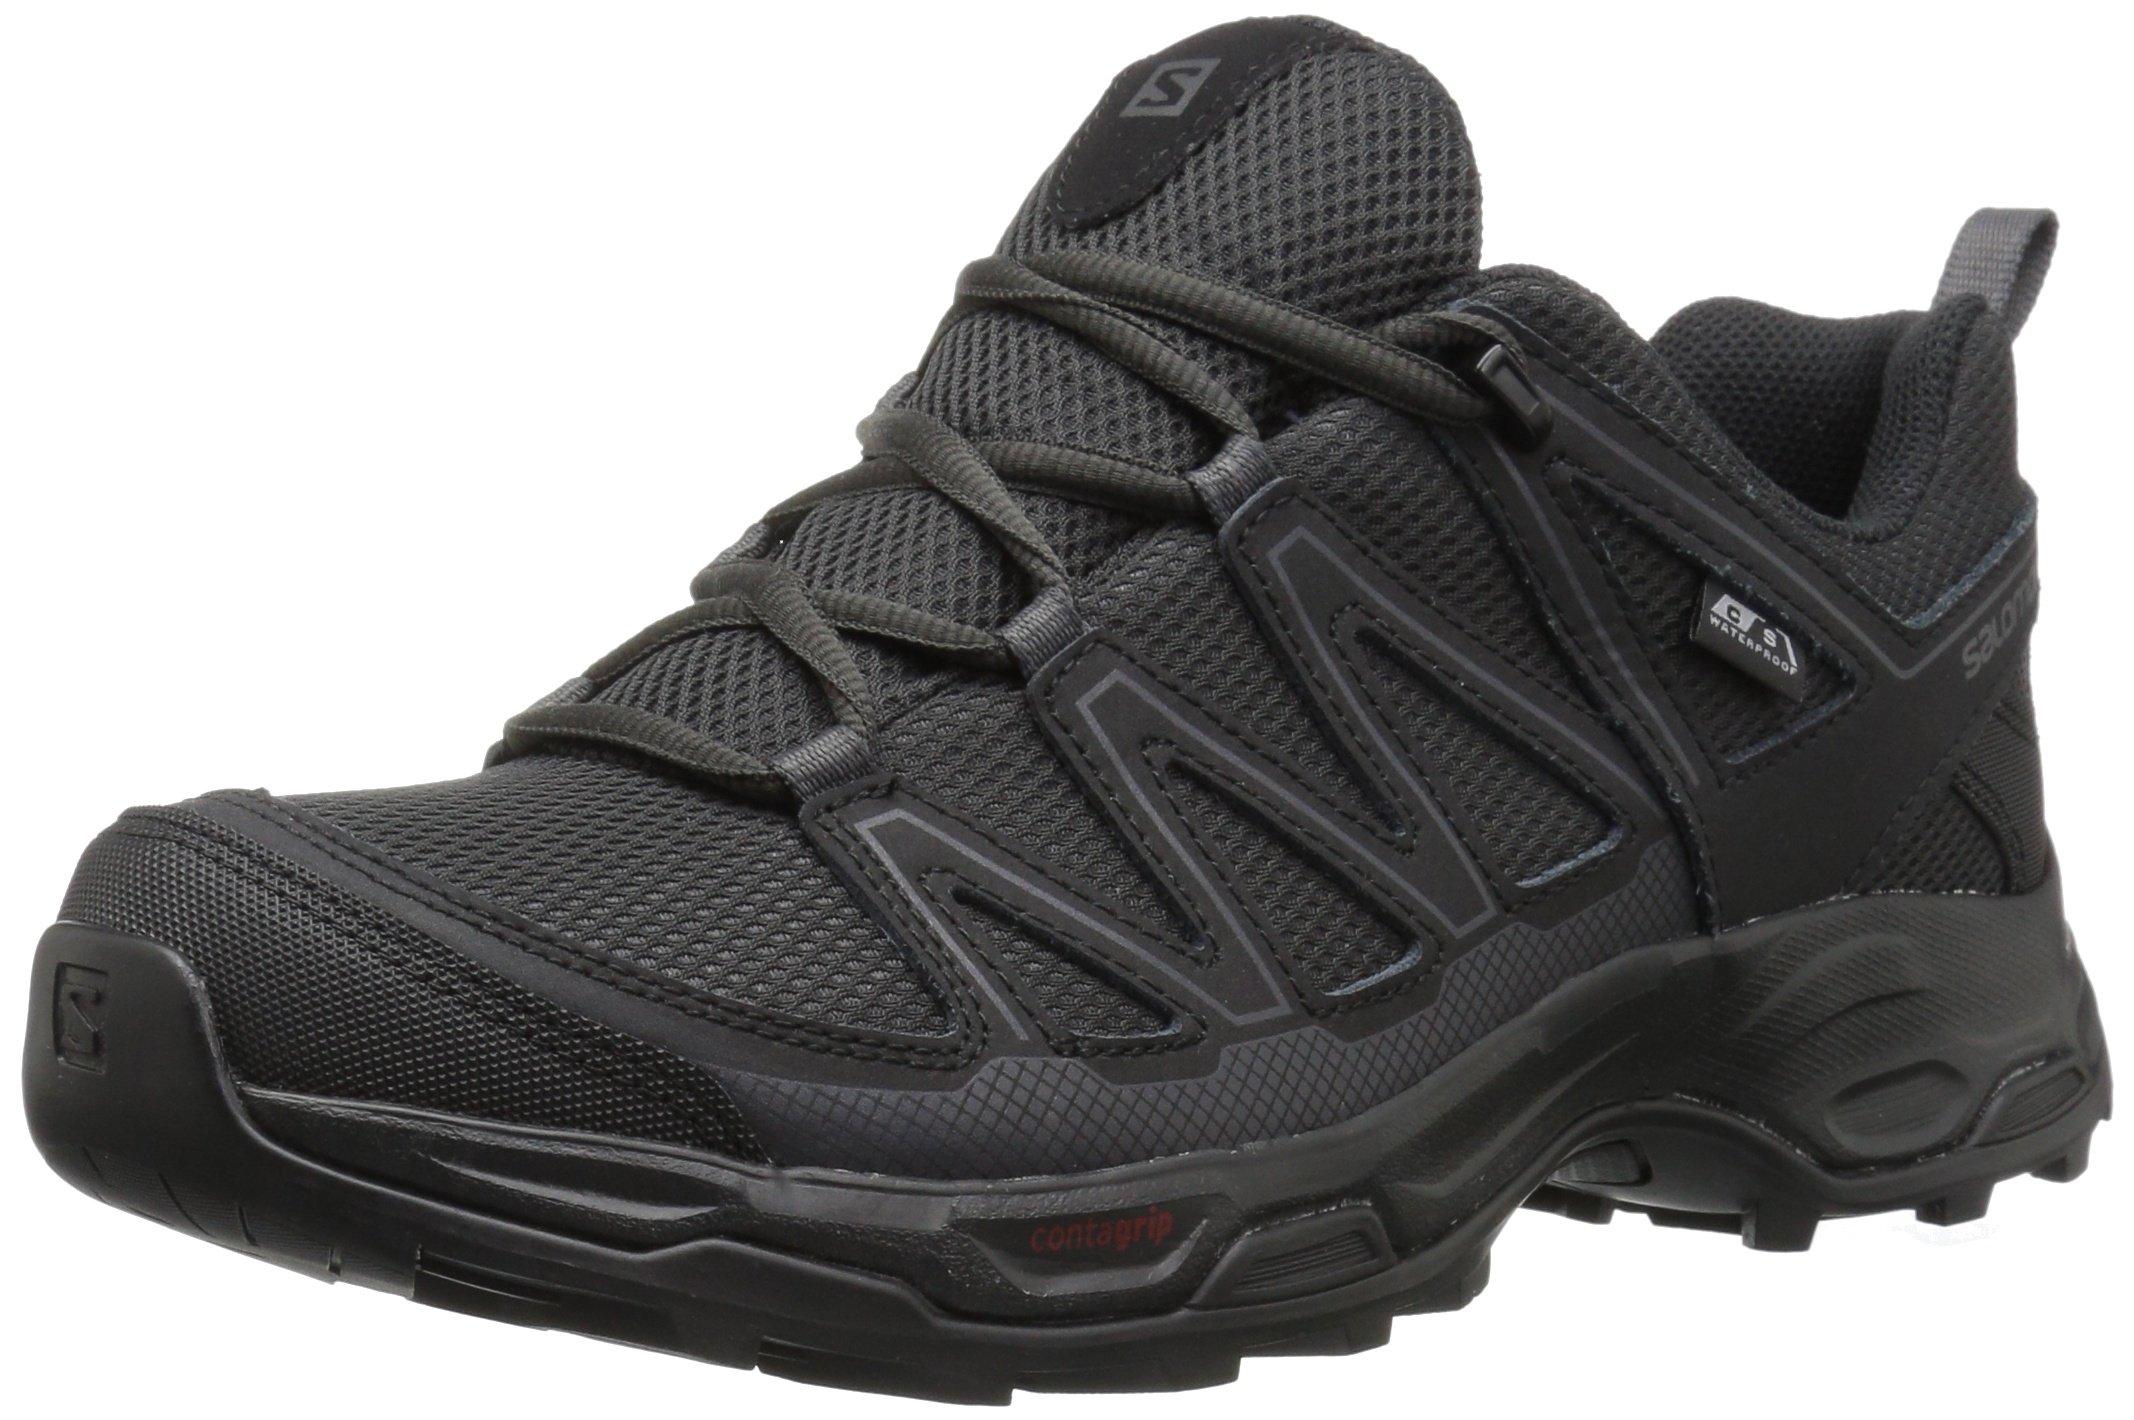 SALOMON Men's Pathfinder CSWP Hiking Shoes, Phantom/Black/Magnet, 11 by SALOMON